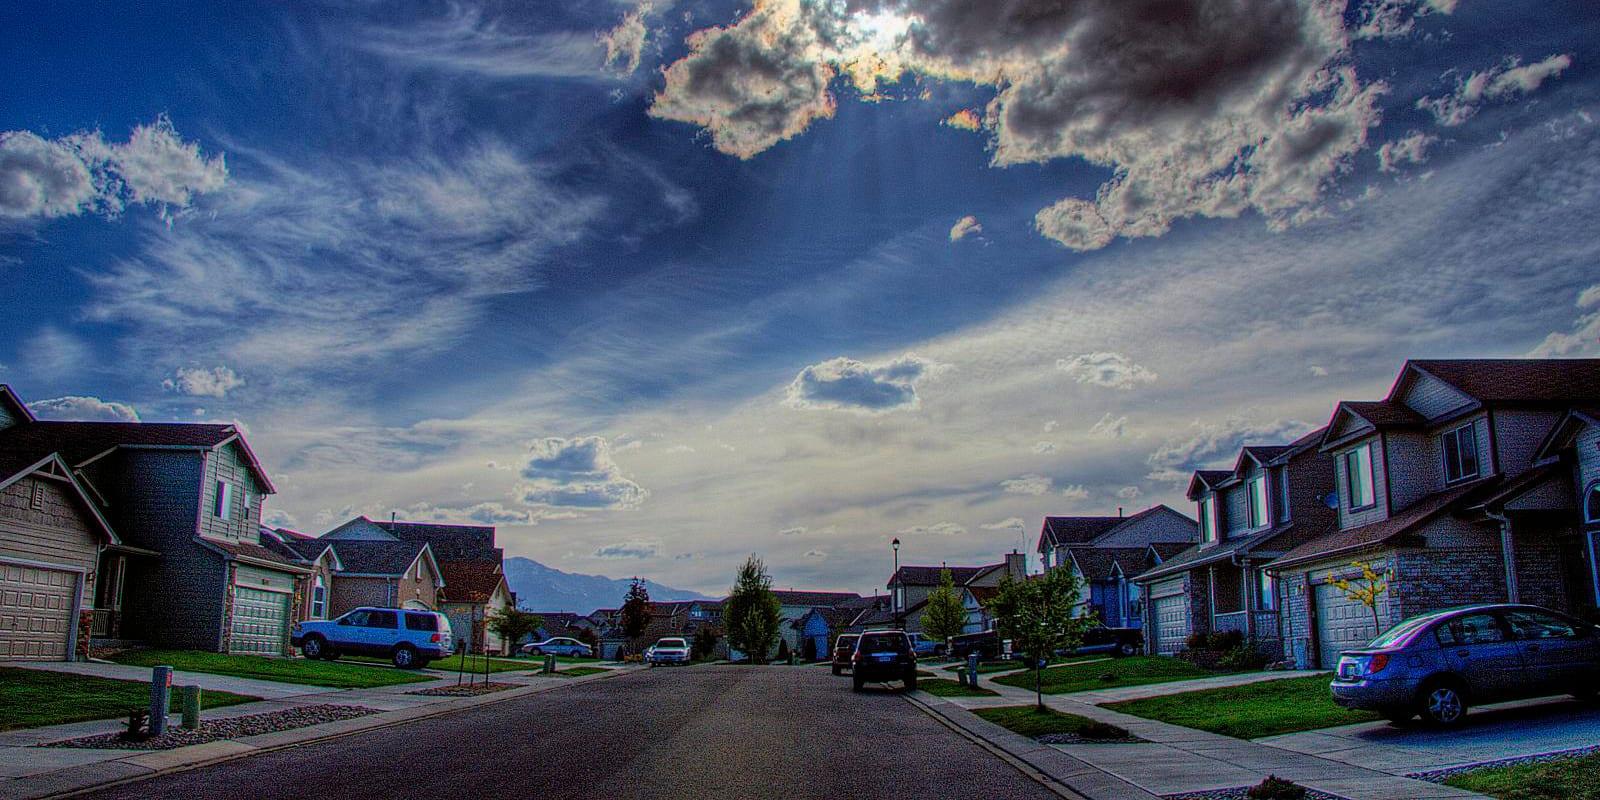 Colorado Springs Home Types Neighborhood Houses